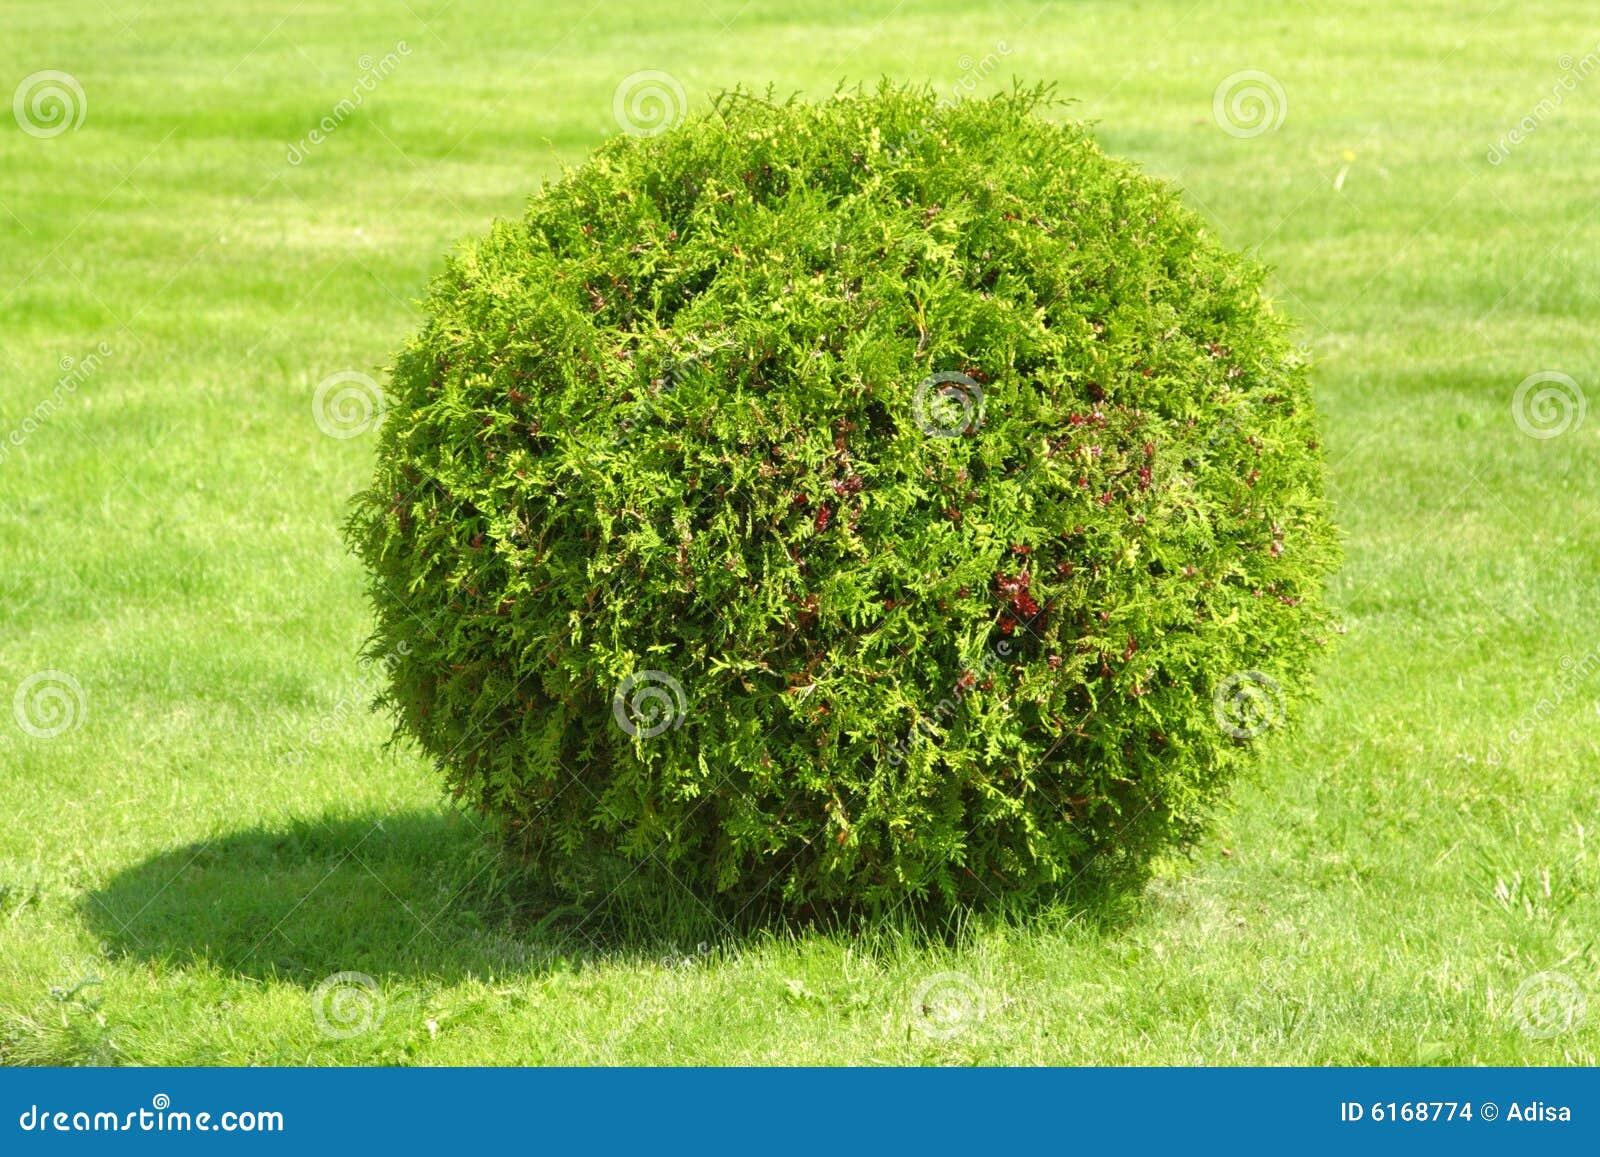 Green bush stock photo. Image of decor, grass, handmade ...